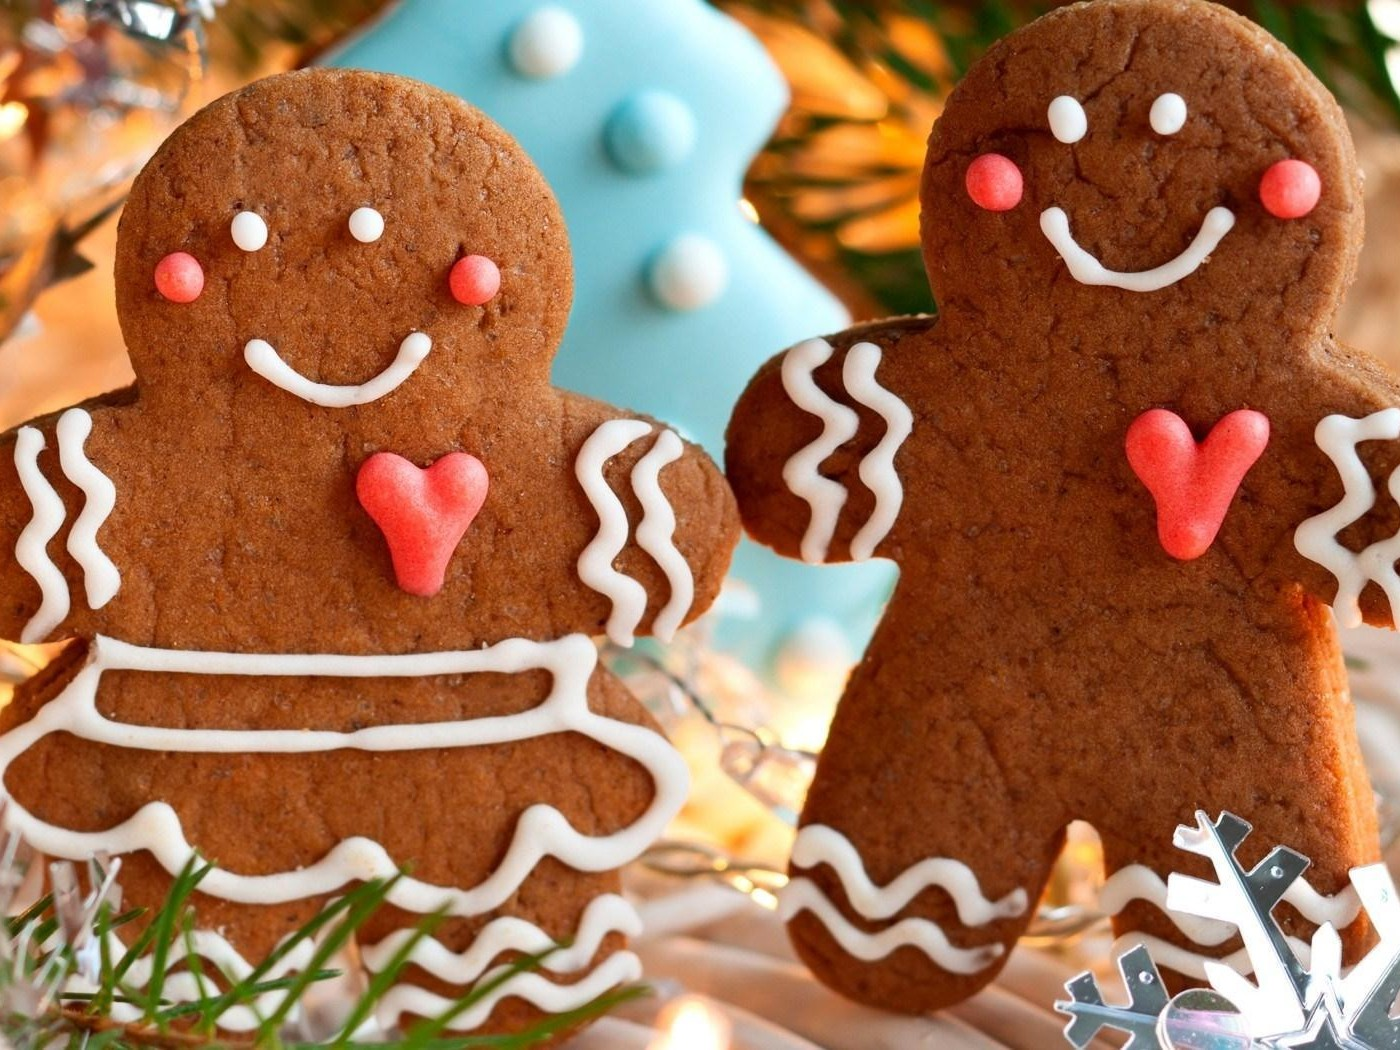 Cookies Figurines Baking Christmas Food Winter HD desktop 1400x1050